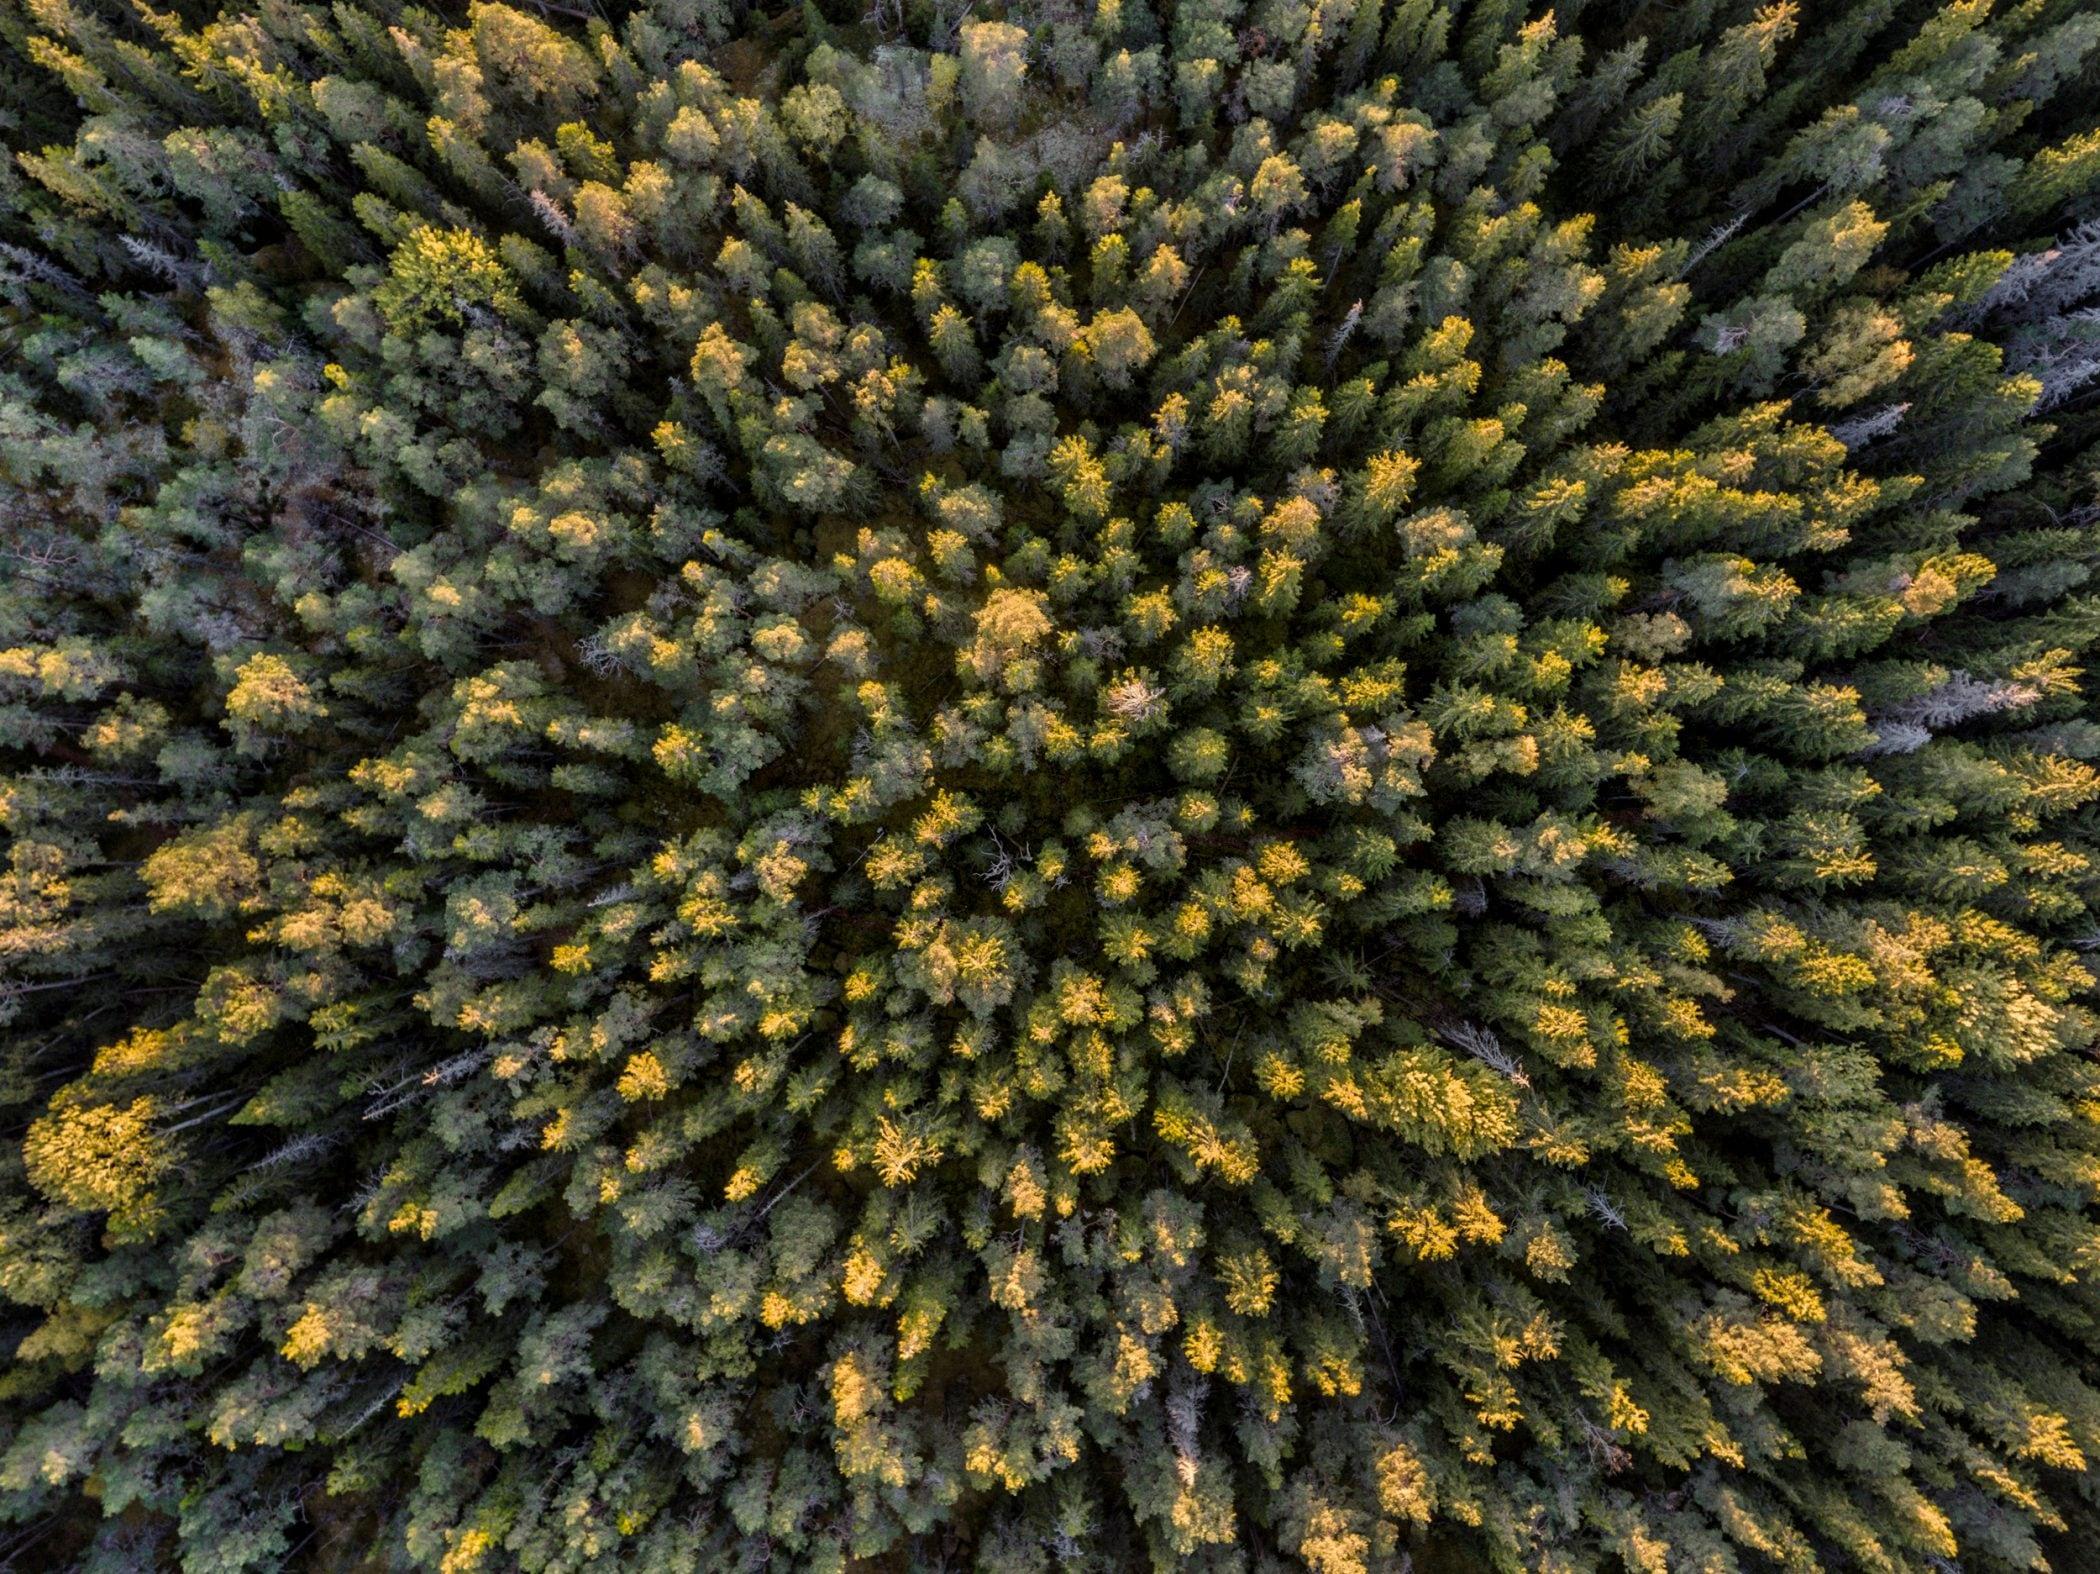 Col·labora a frenar la tala il·legal d'arbres